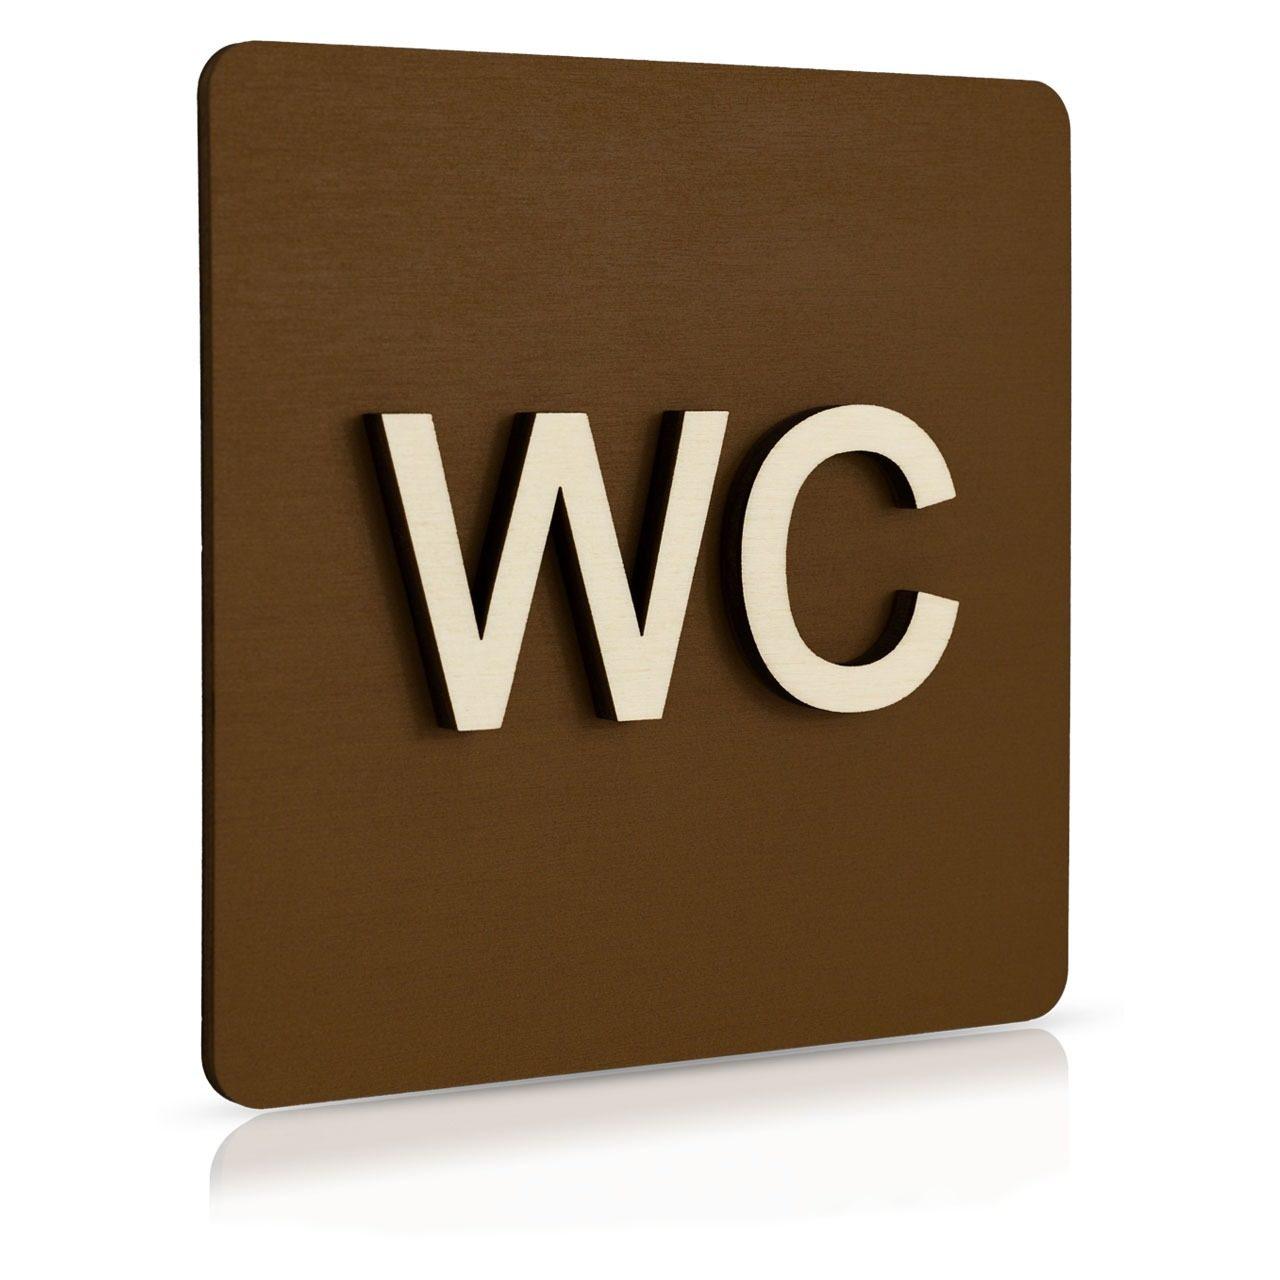 "Holz-Türschild (schokobraun) ""WC"""